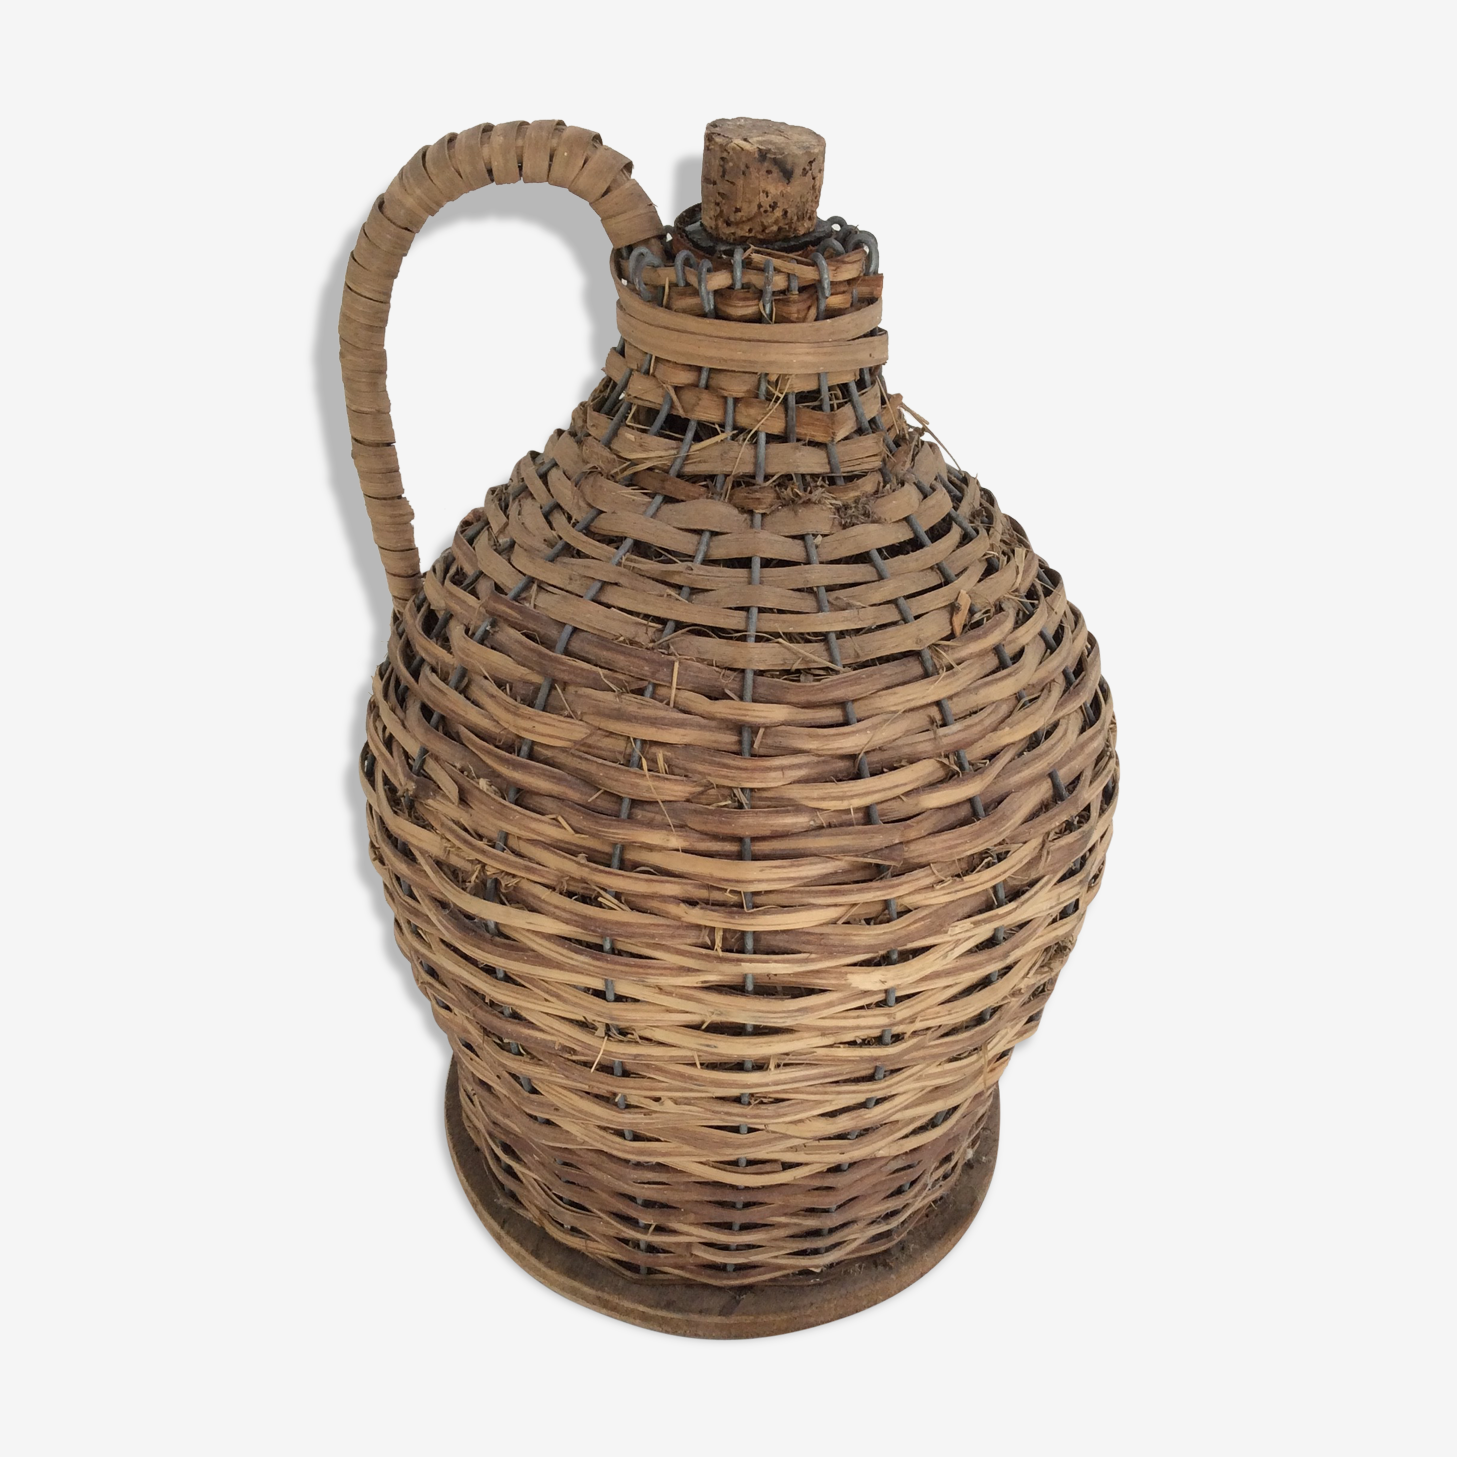 Demijohn in straw and wicker